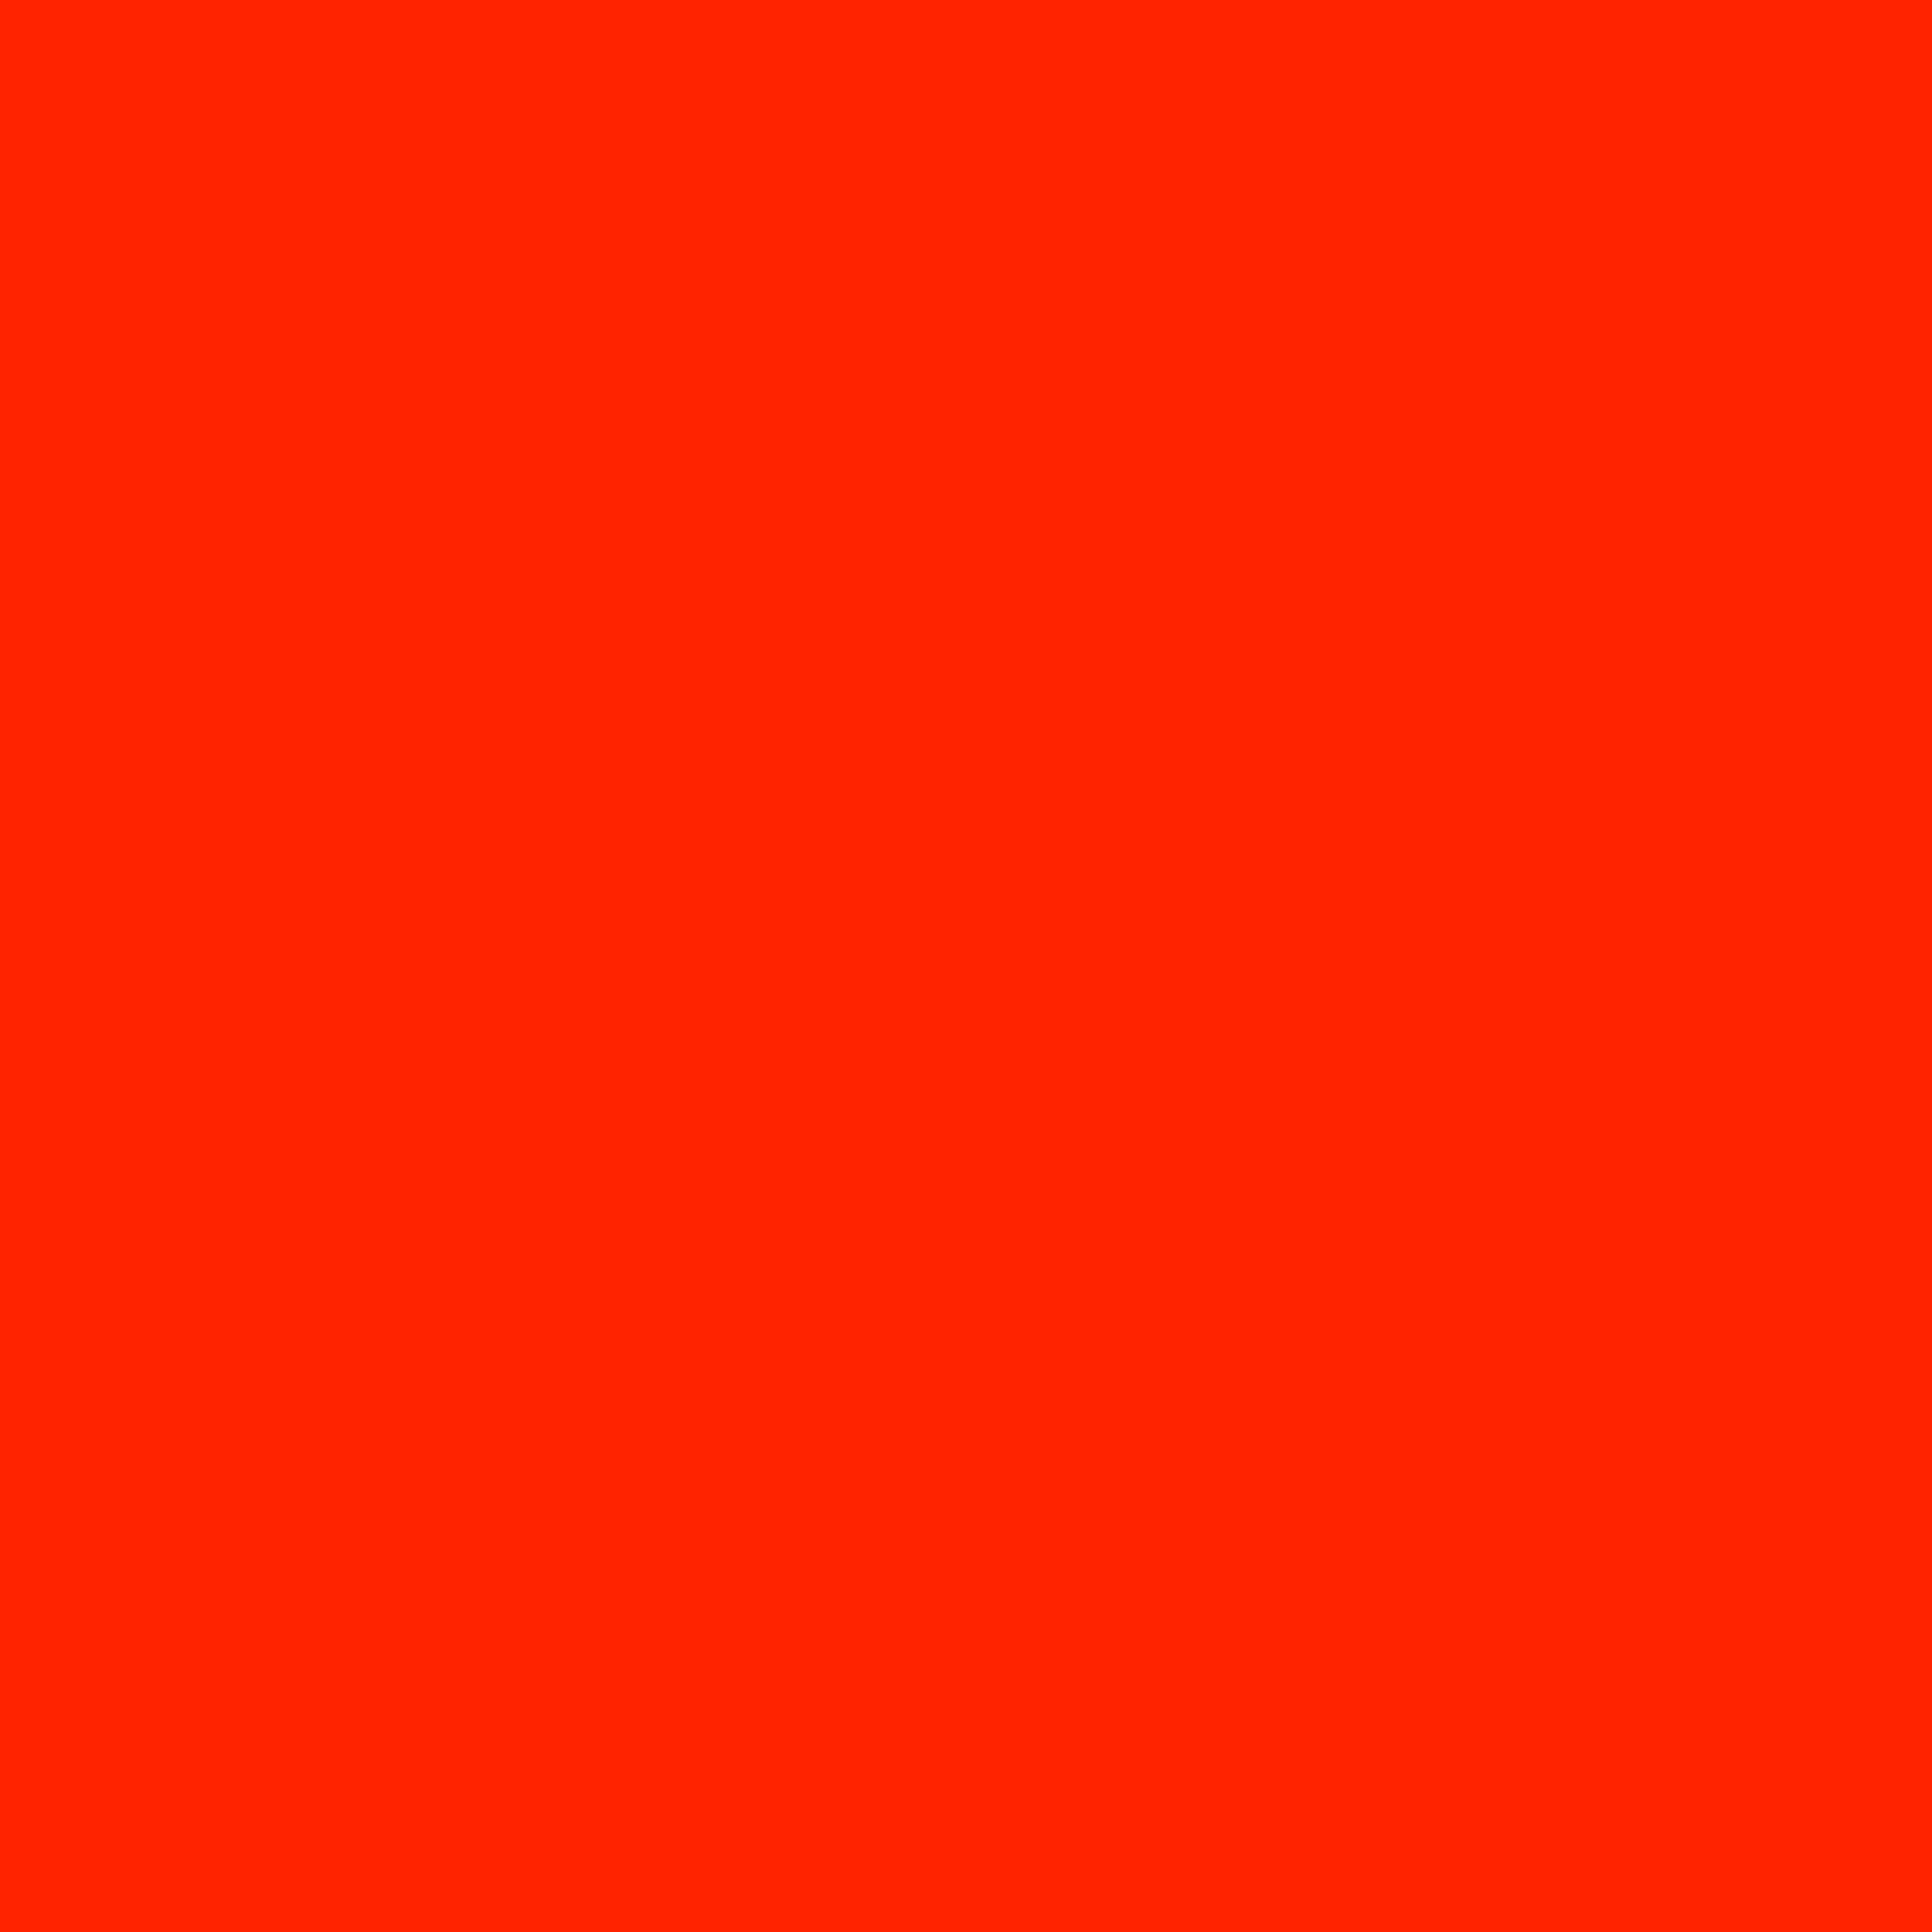 2732x2732 Scarlet Solid Color Background